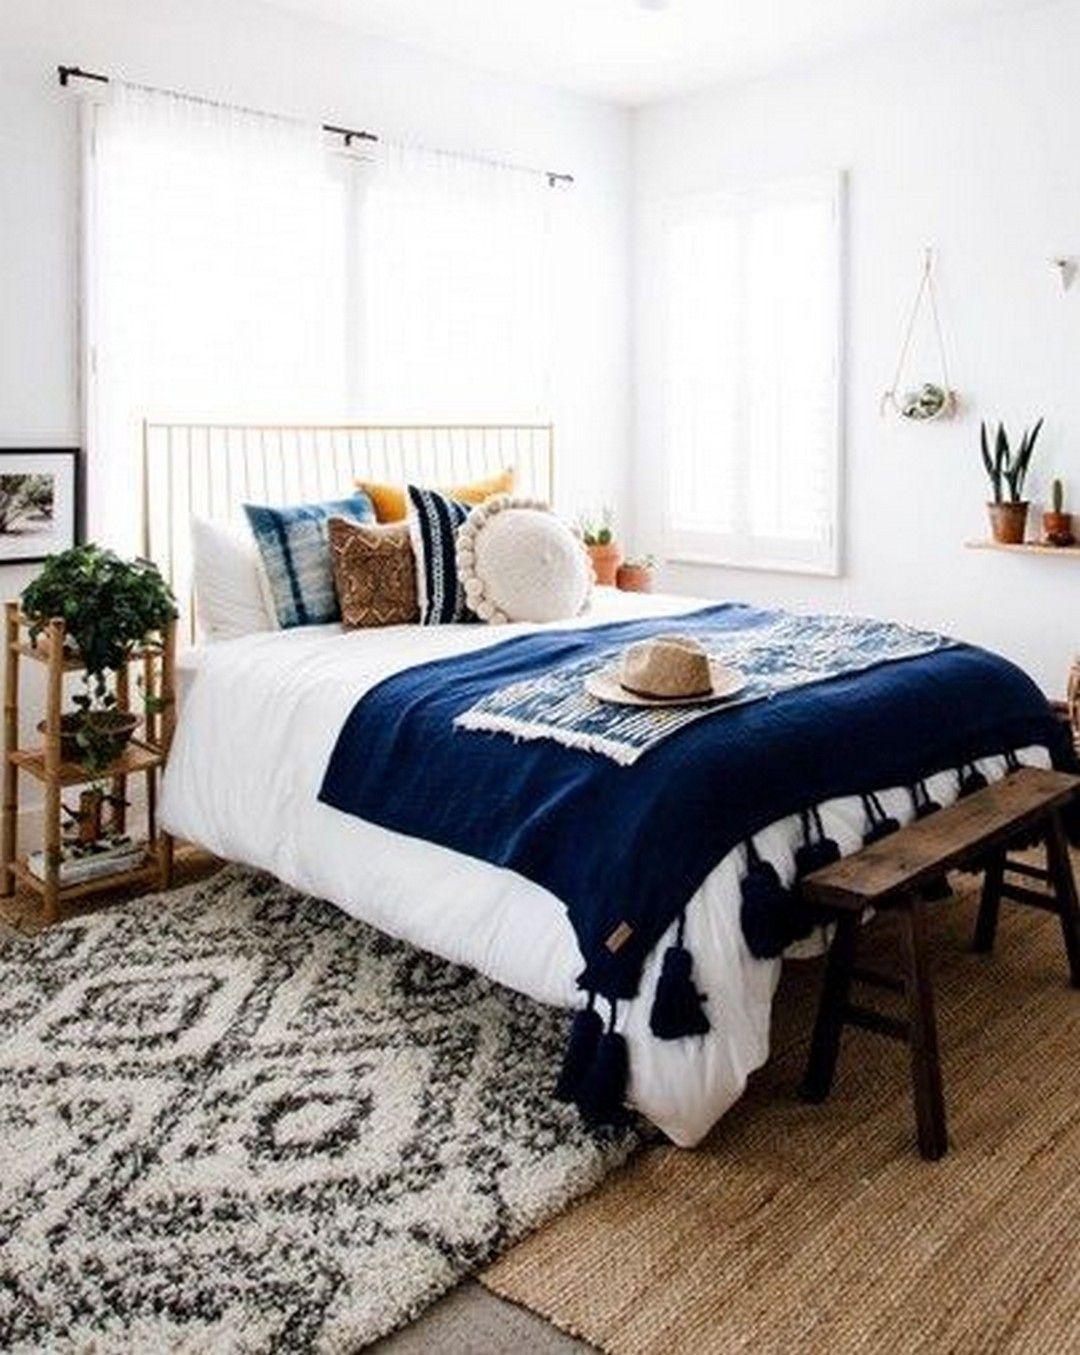 Elegant and Simple Bedroom Decors